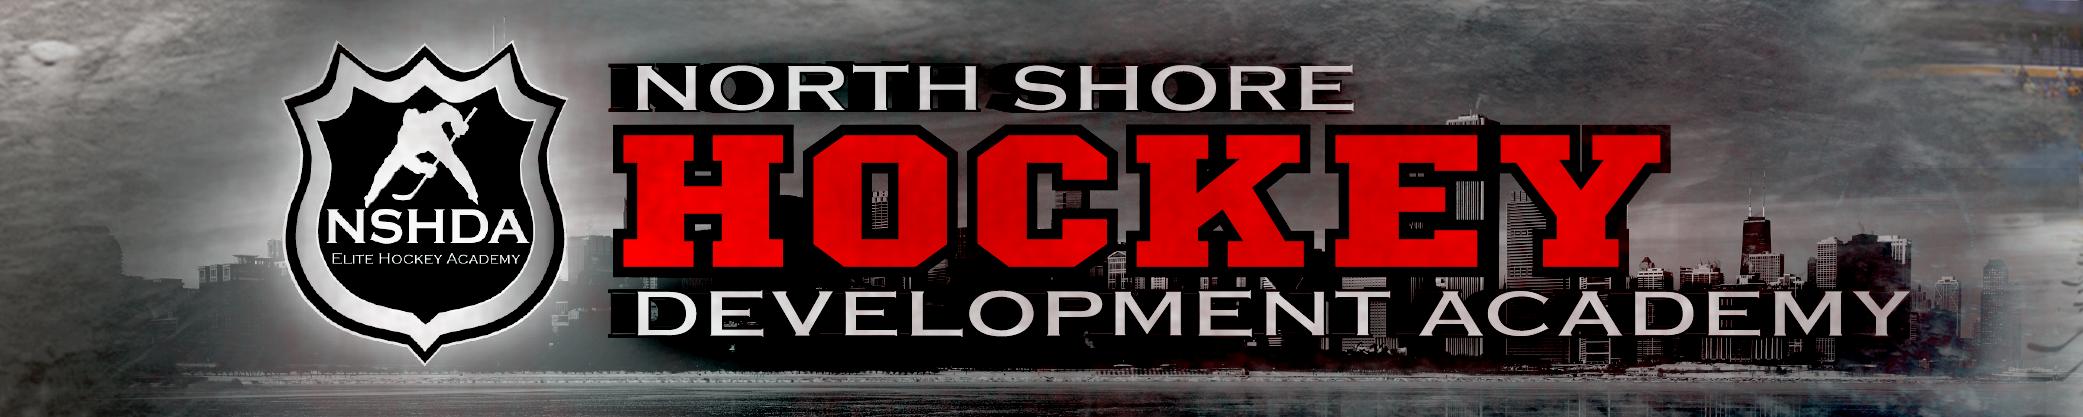 North Shore Hockey Development Academy, Hockey, Goal, Rink